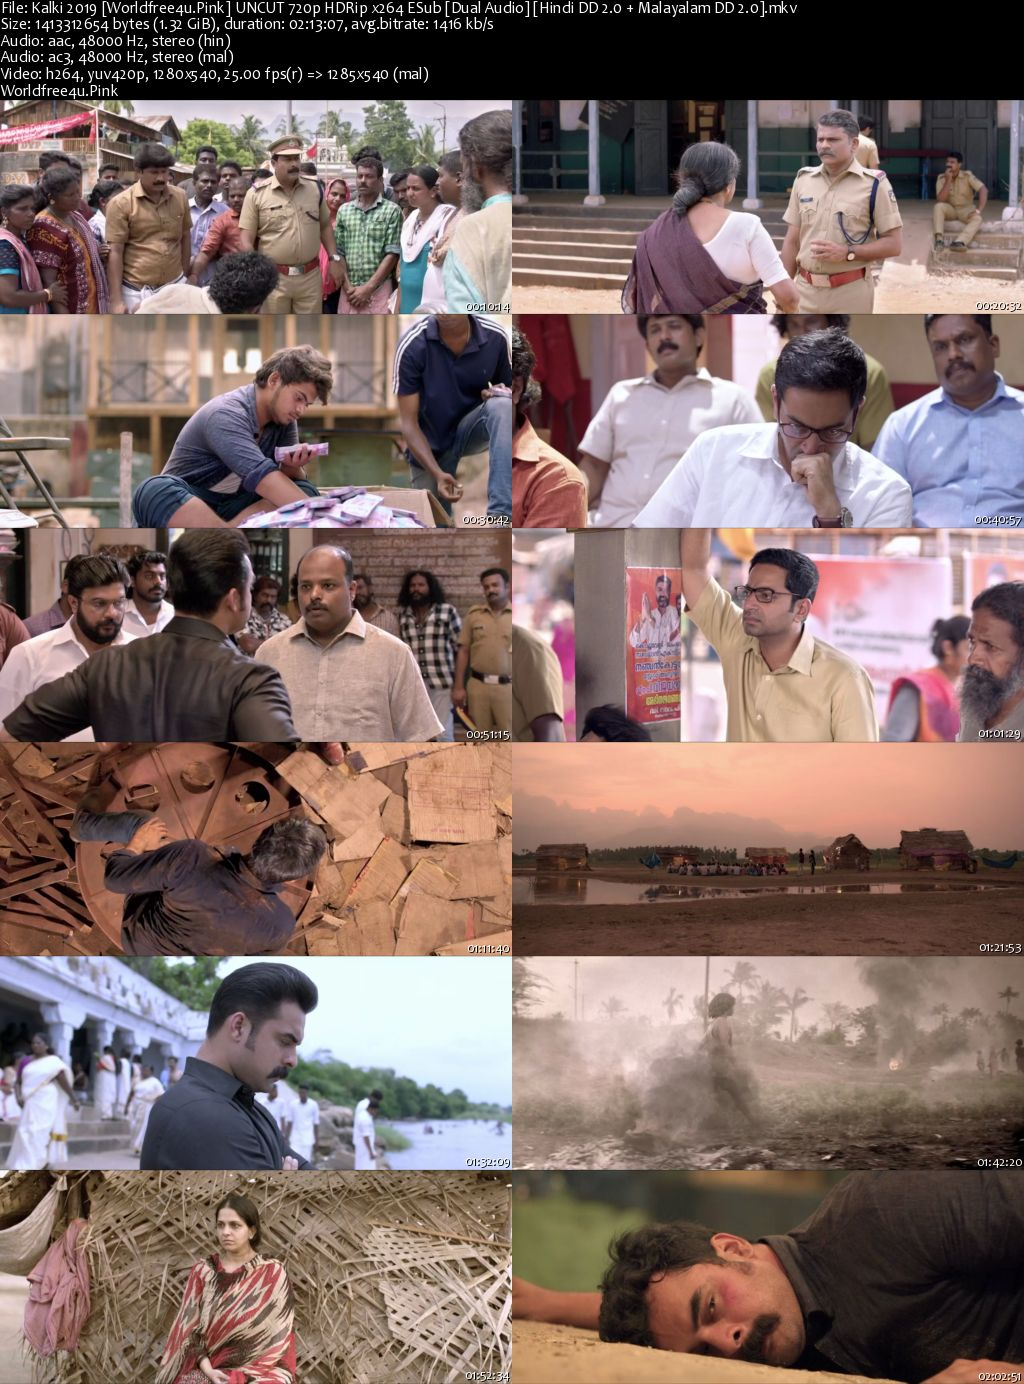 Kalki 2019 Hindi Dubbed HDRip 720p